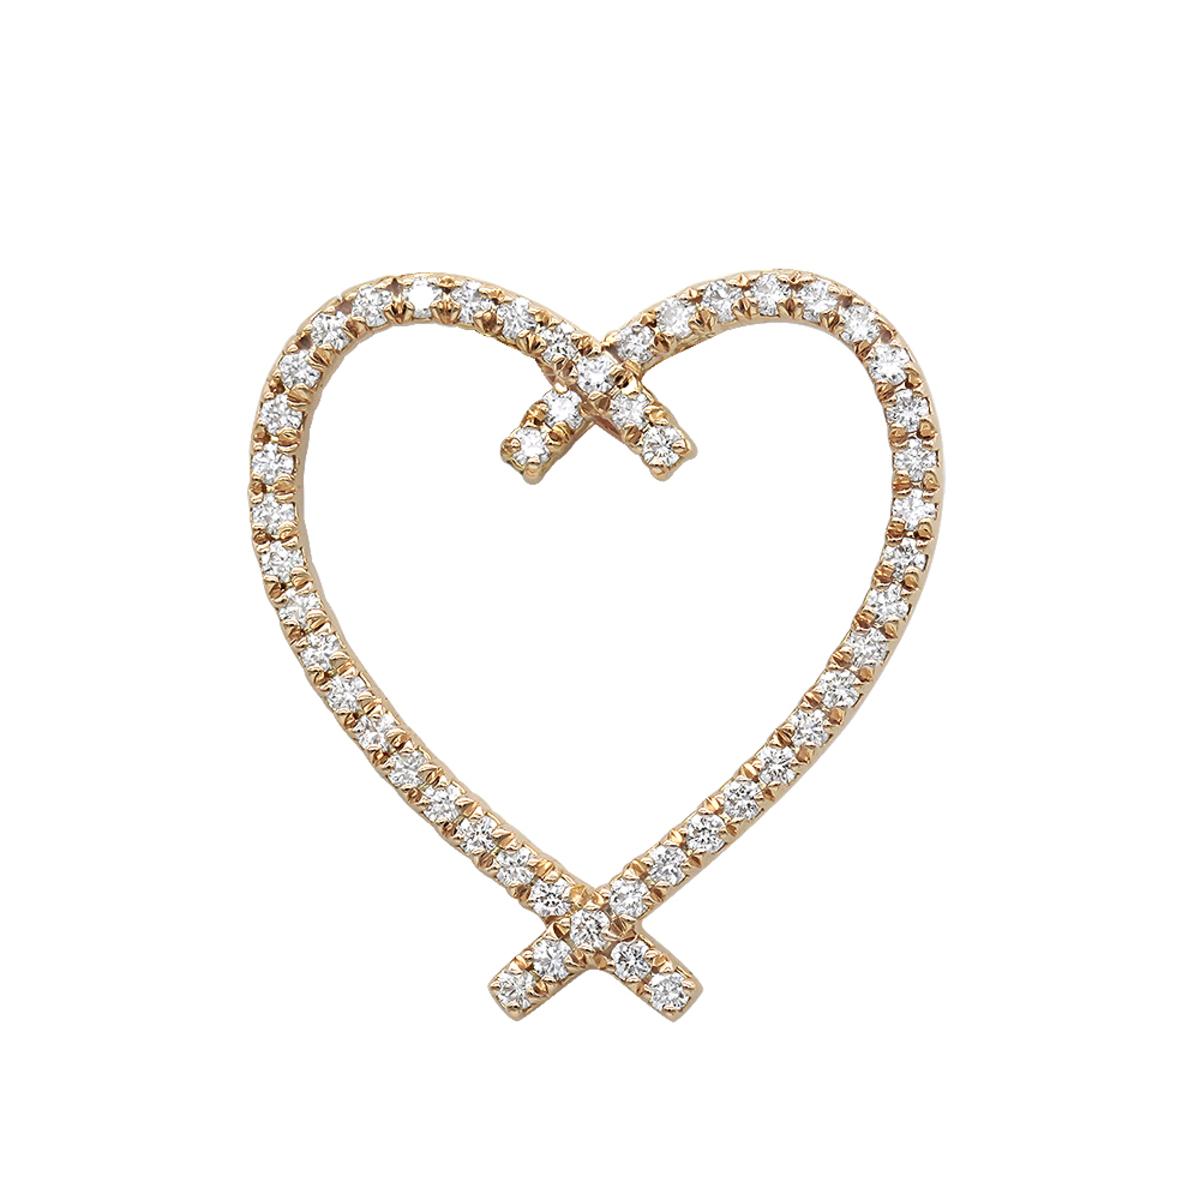 Designer 14 Karat Gold Diamond Heart Pendant 0.63ct